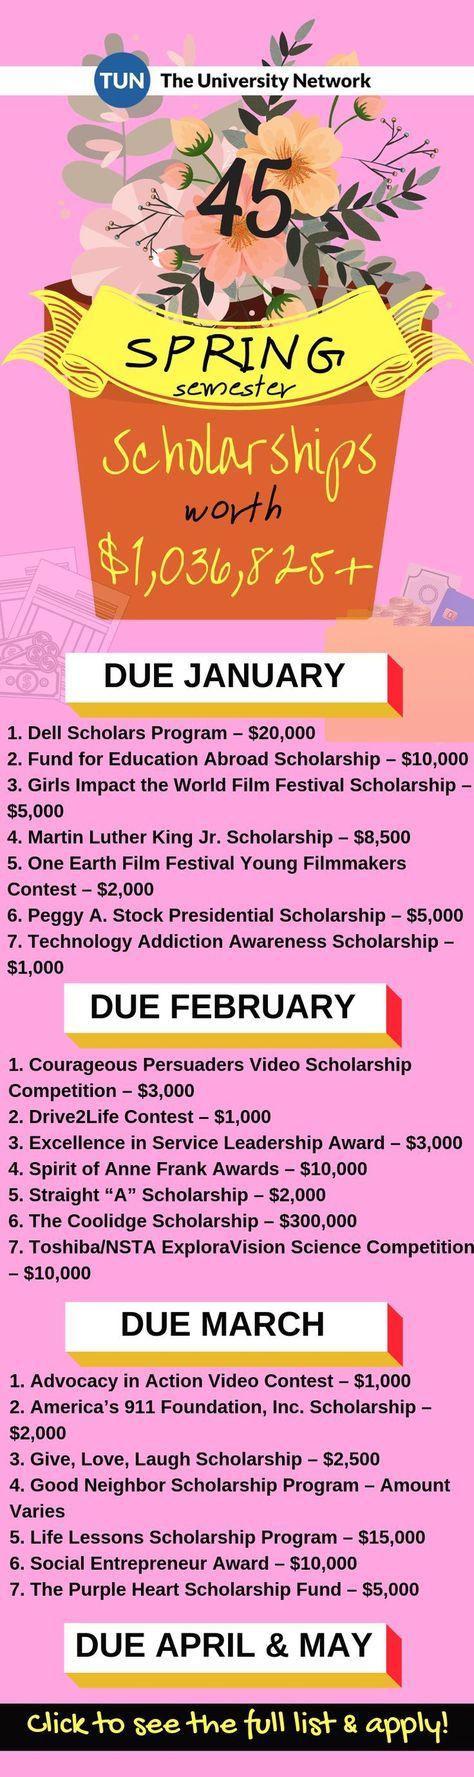 45 Spring Scholarships Worth $1,036,825